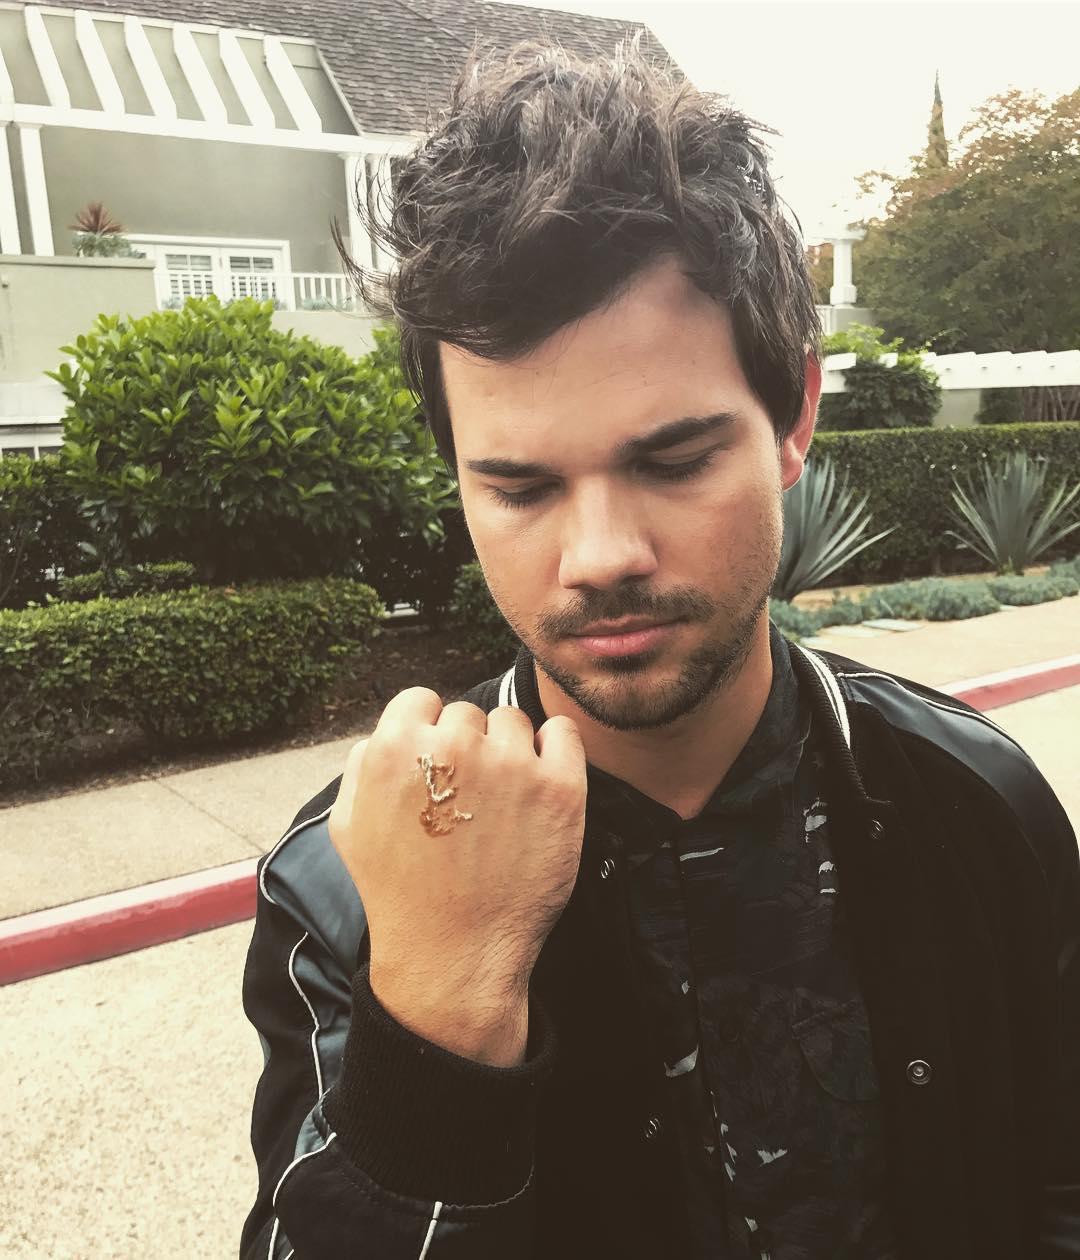 Taylor Lautner Instagram username